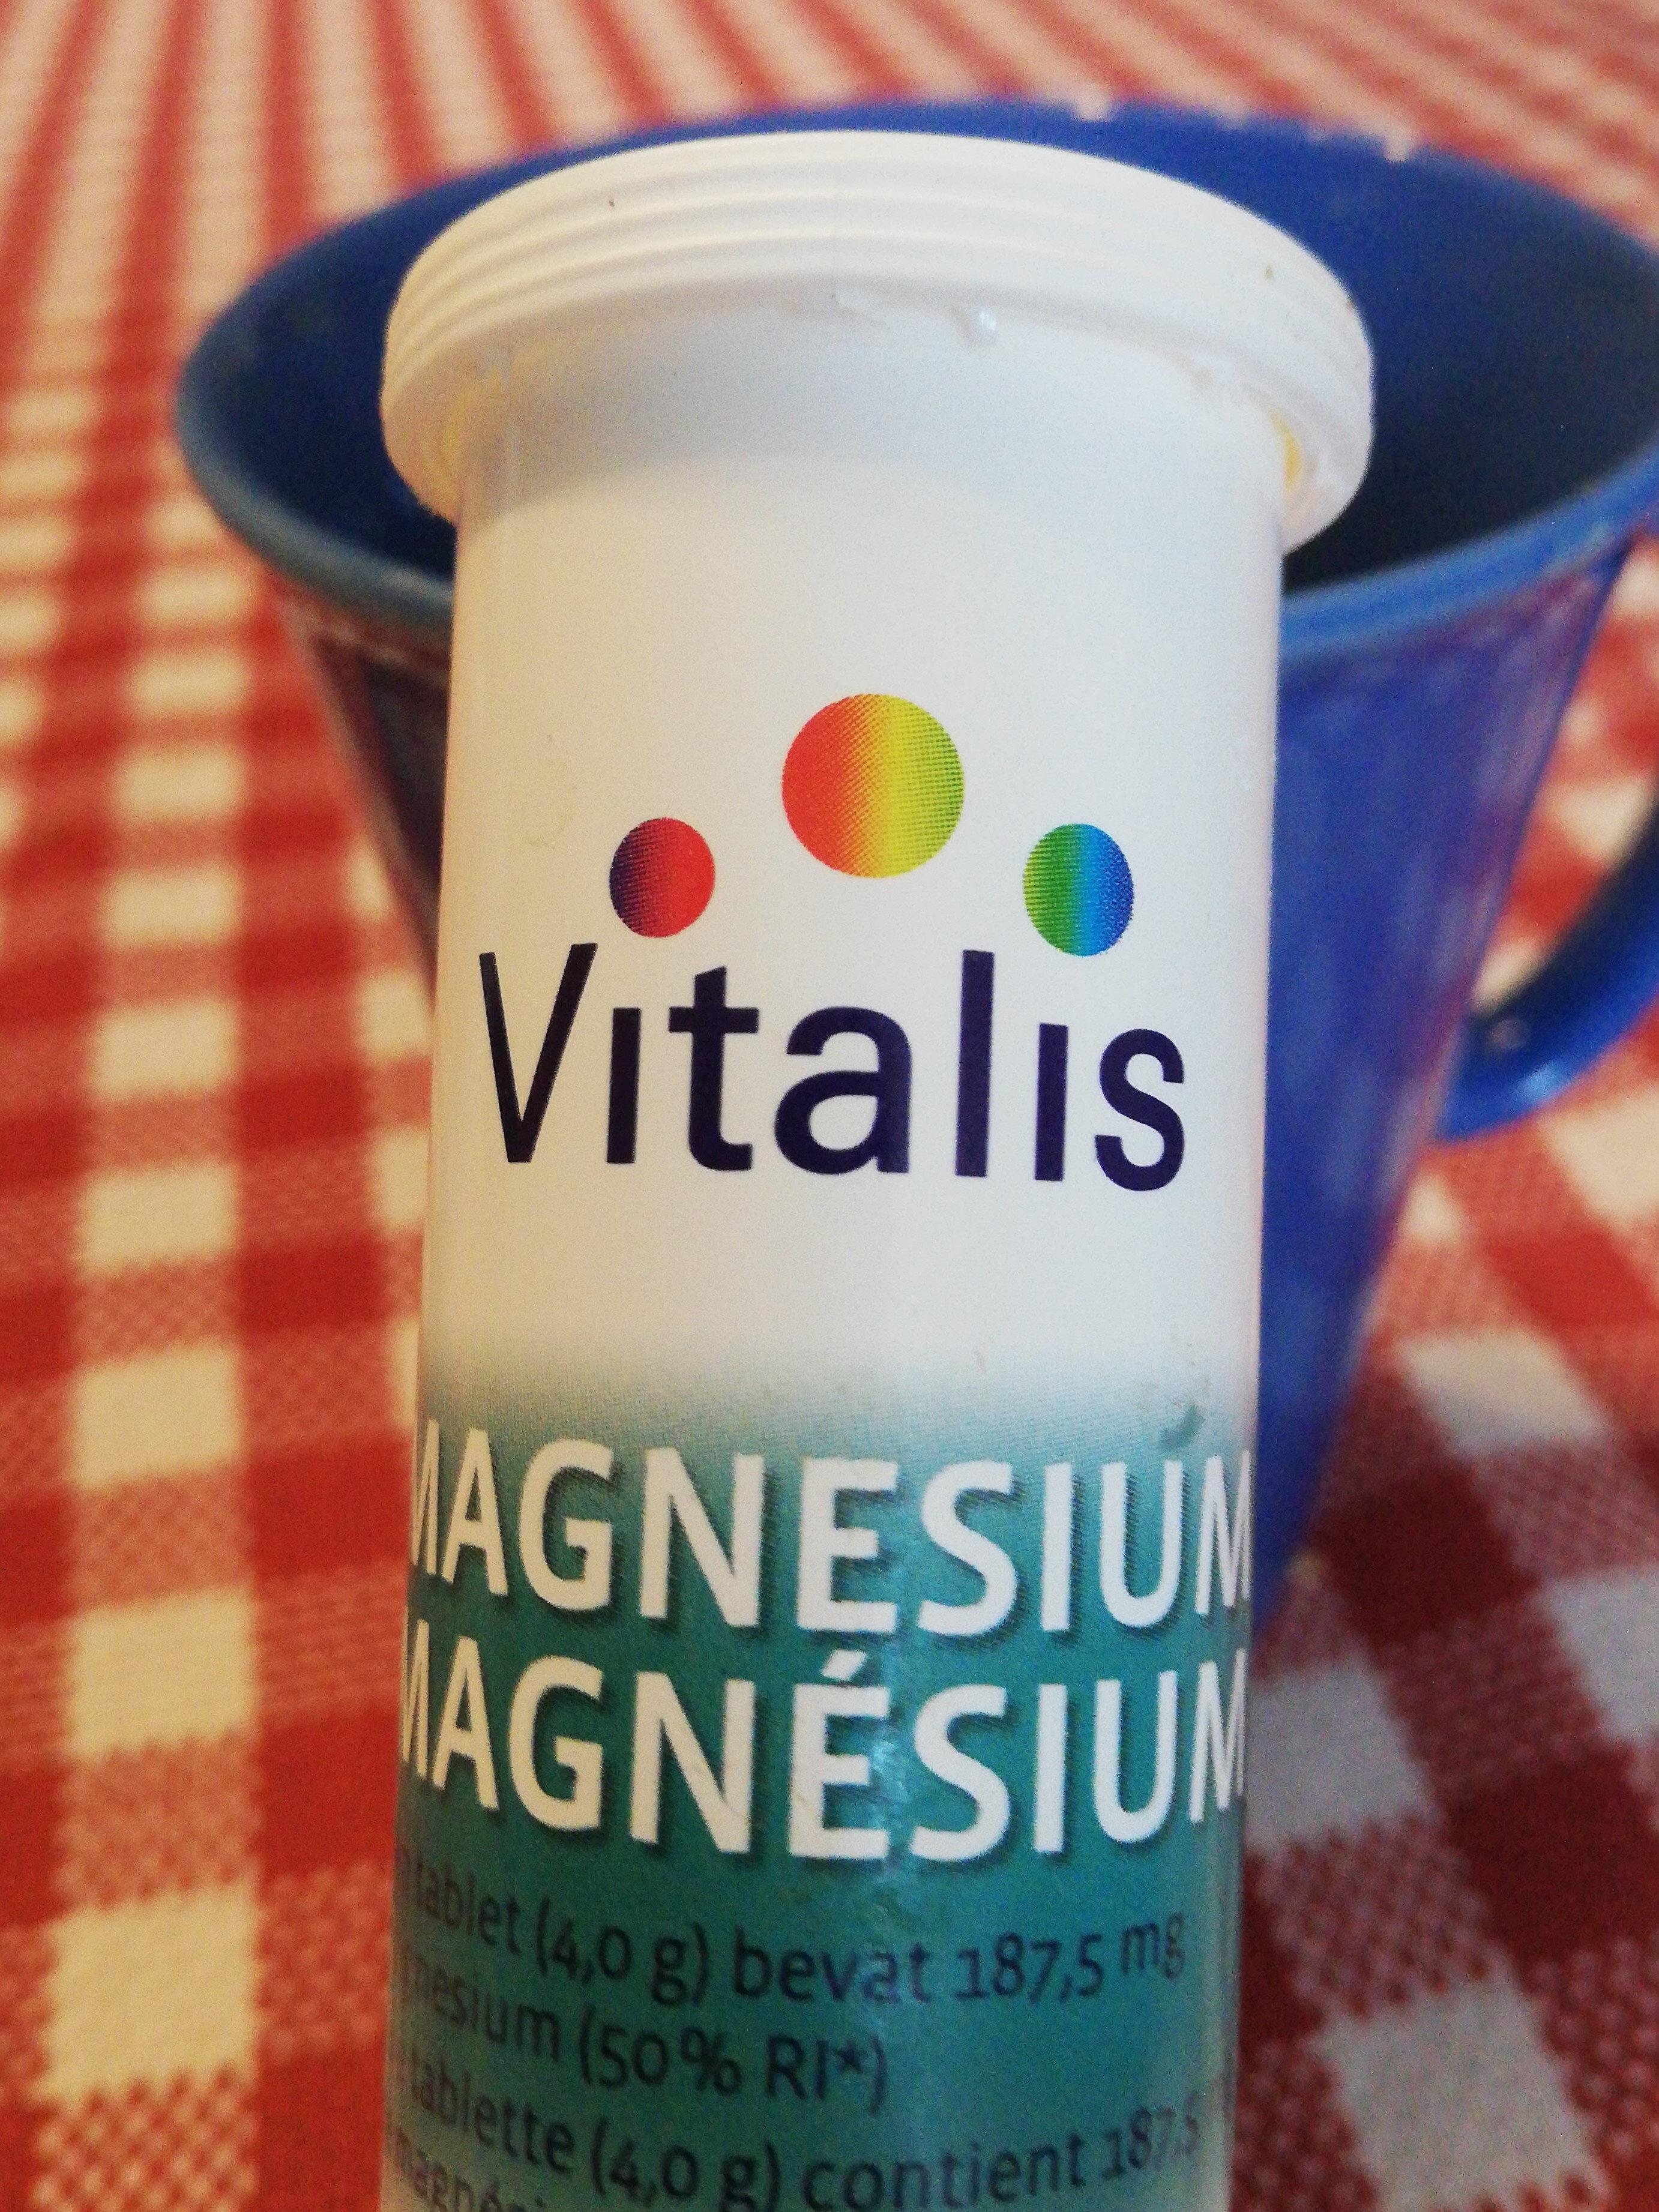 Pastilles magnésium - Product